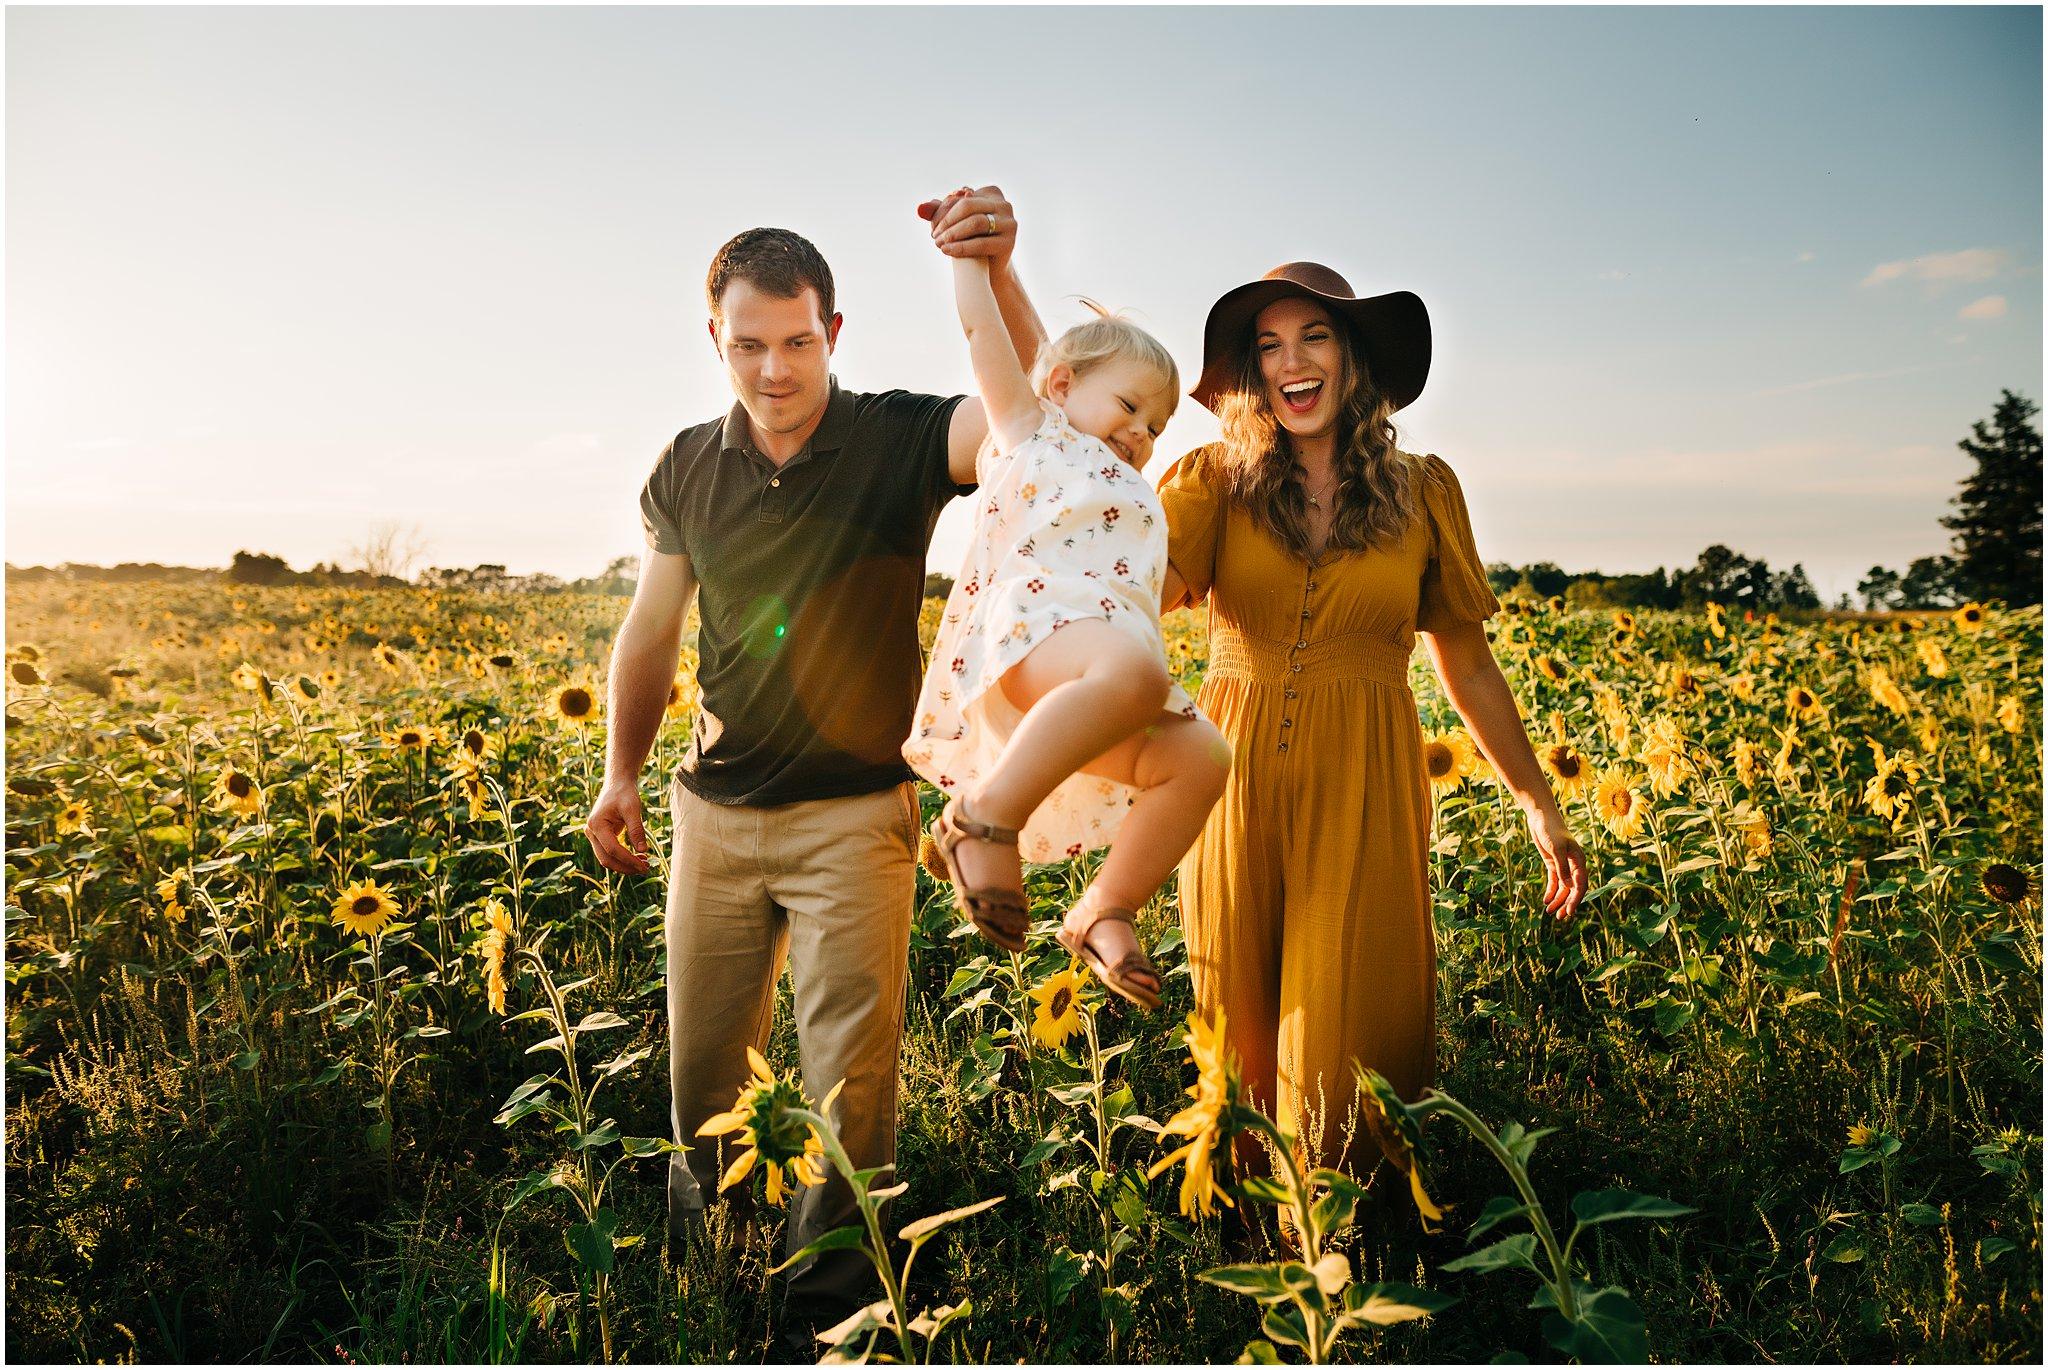 Lansing, Novi, Ann Arbor, Brighton Family, Senior, Newborn, Maternity Photographer